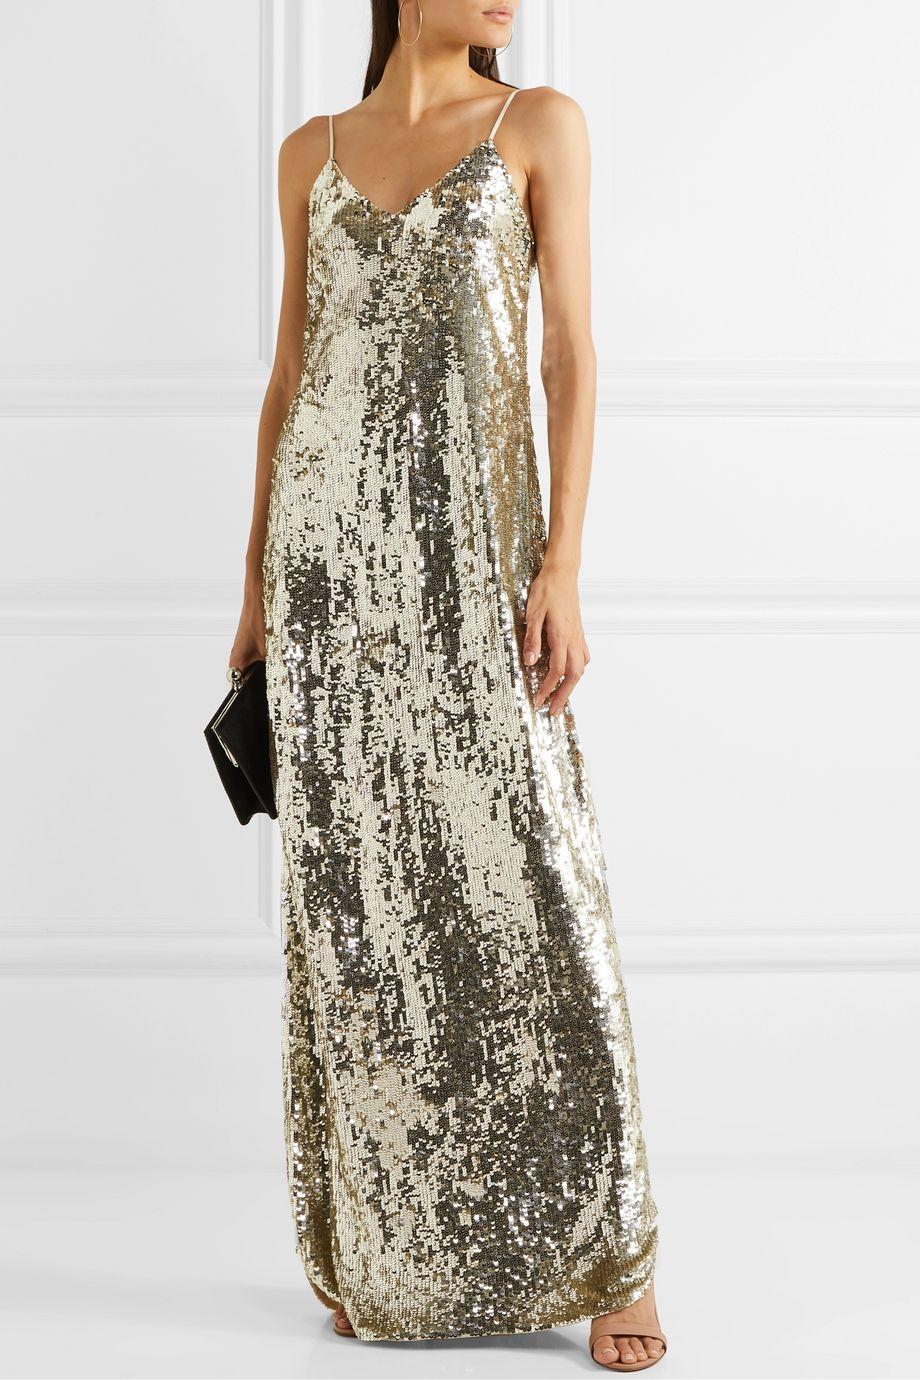 Nili Lotan Sequined chiffon gown